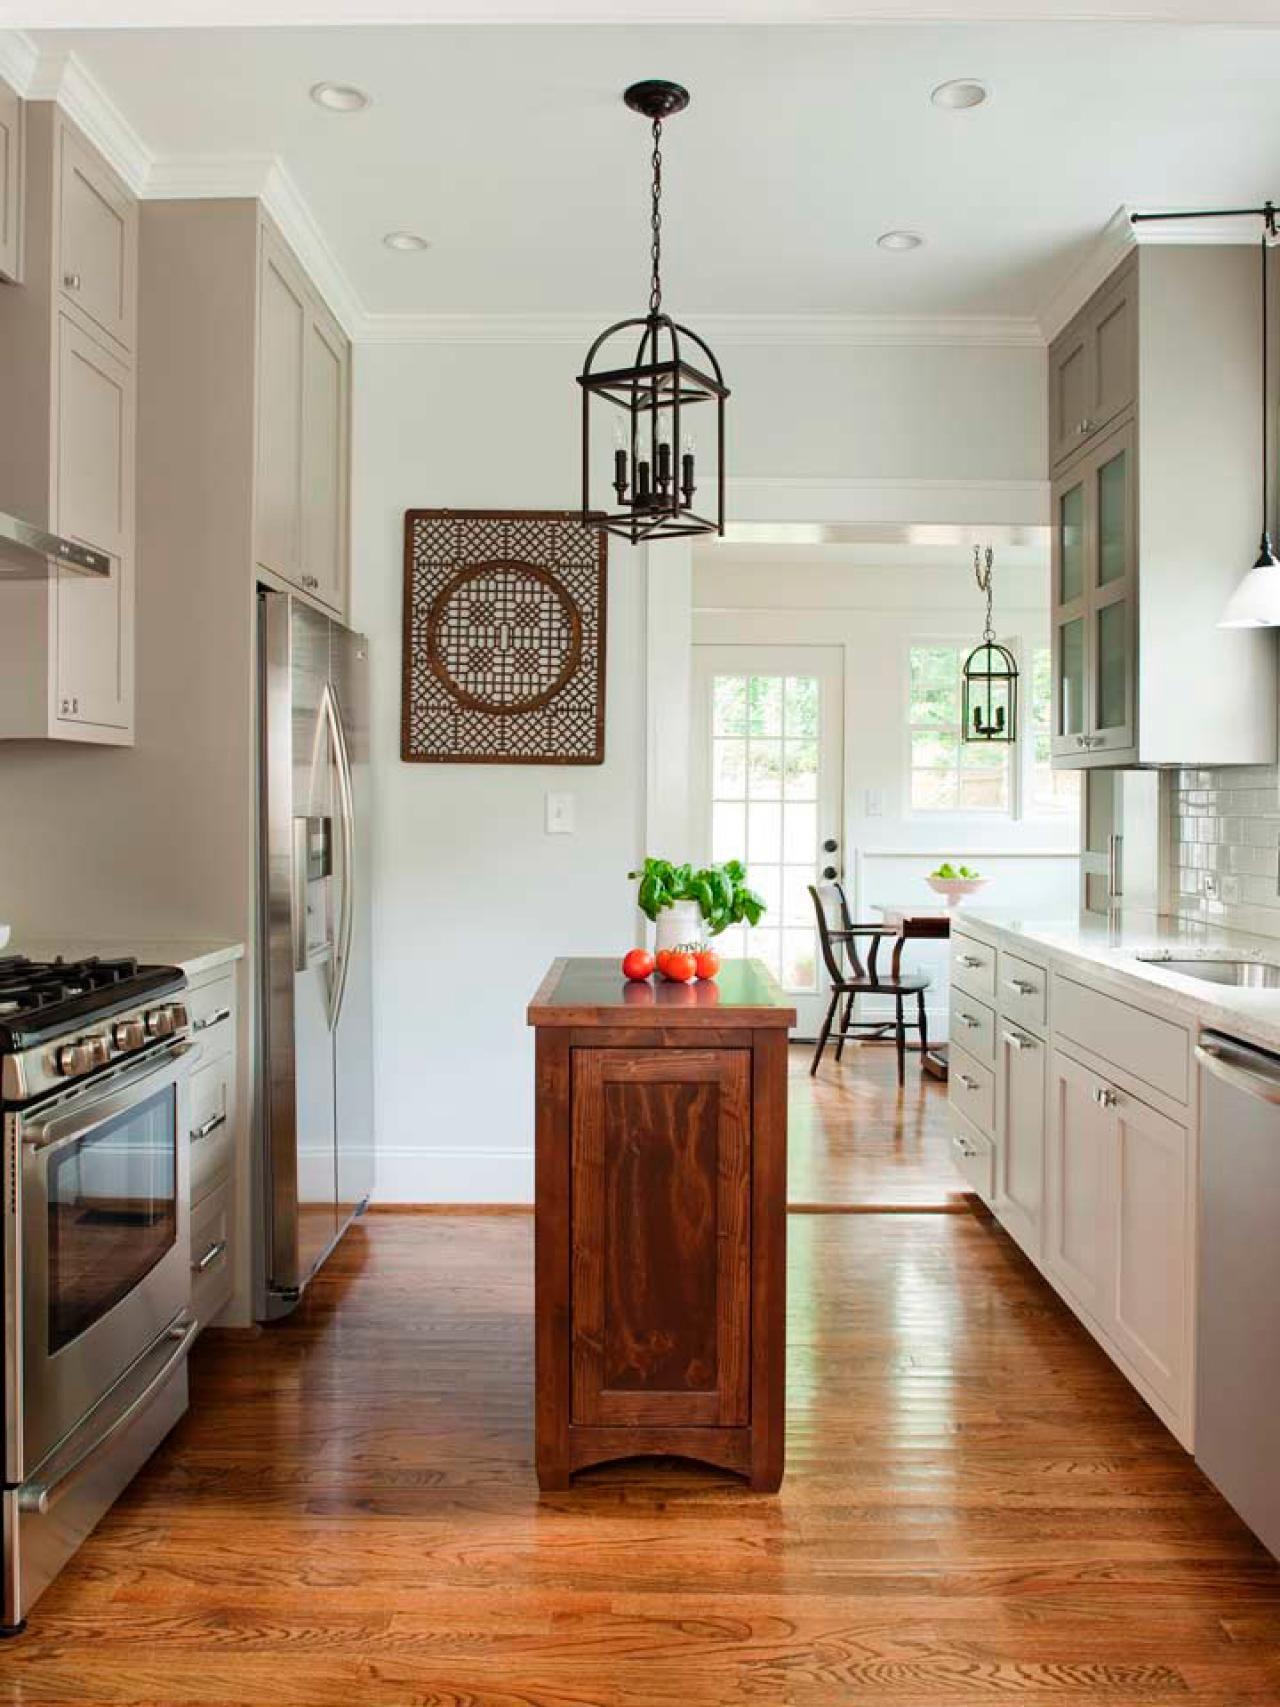 Unique kitchen chandelier